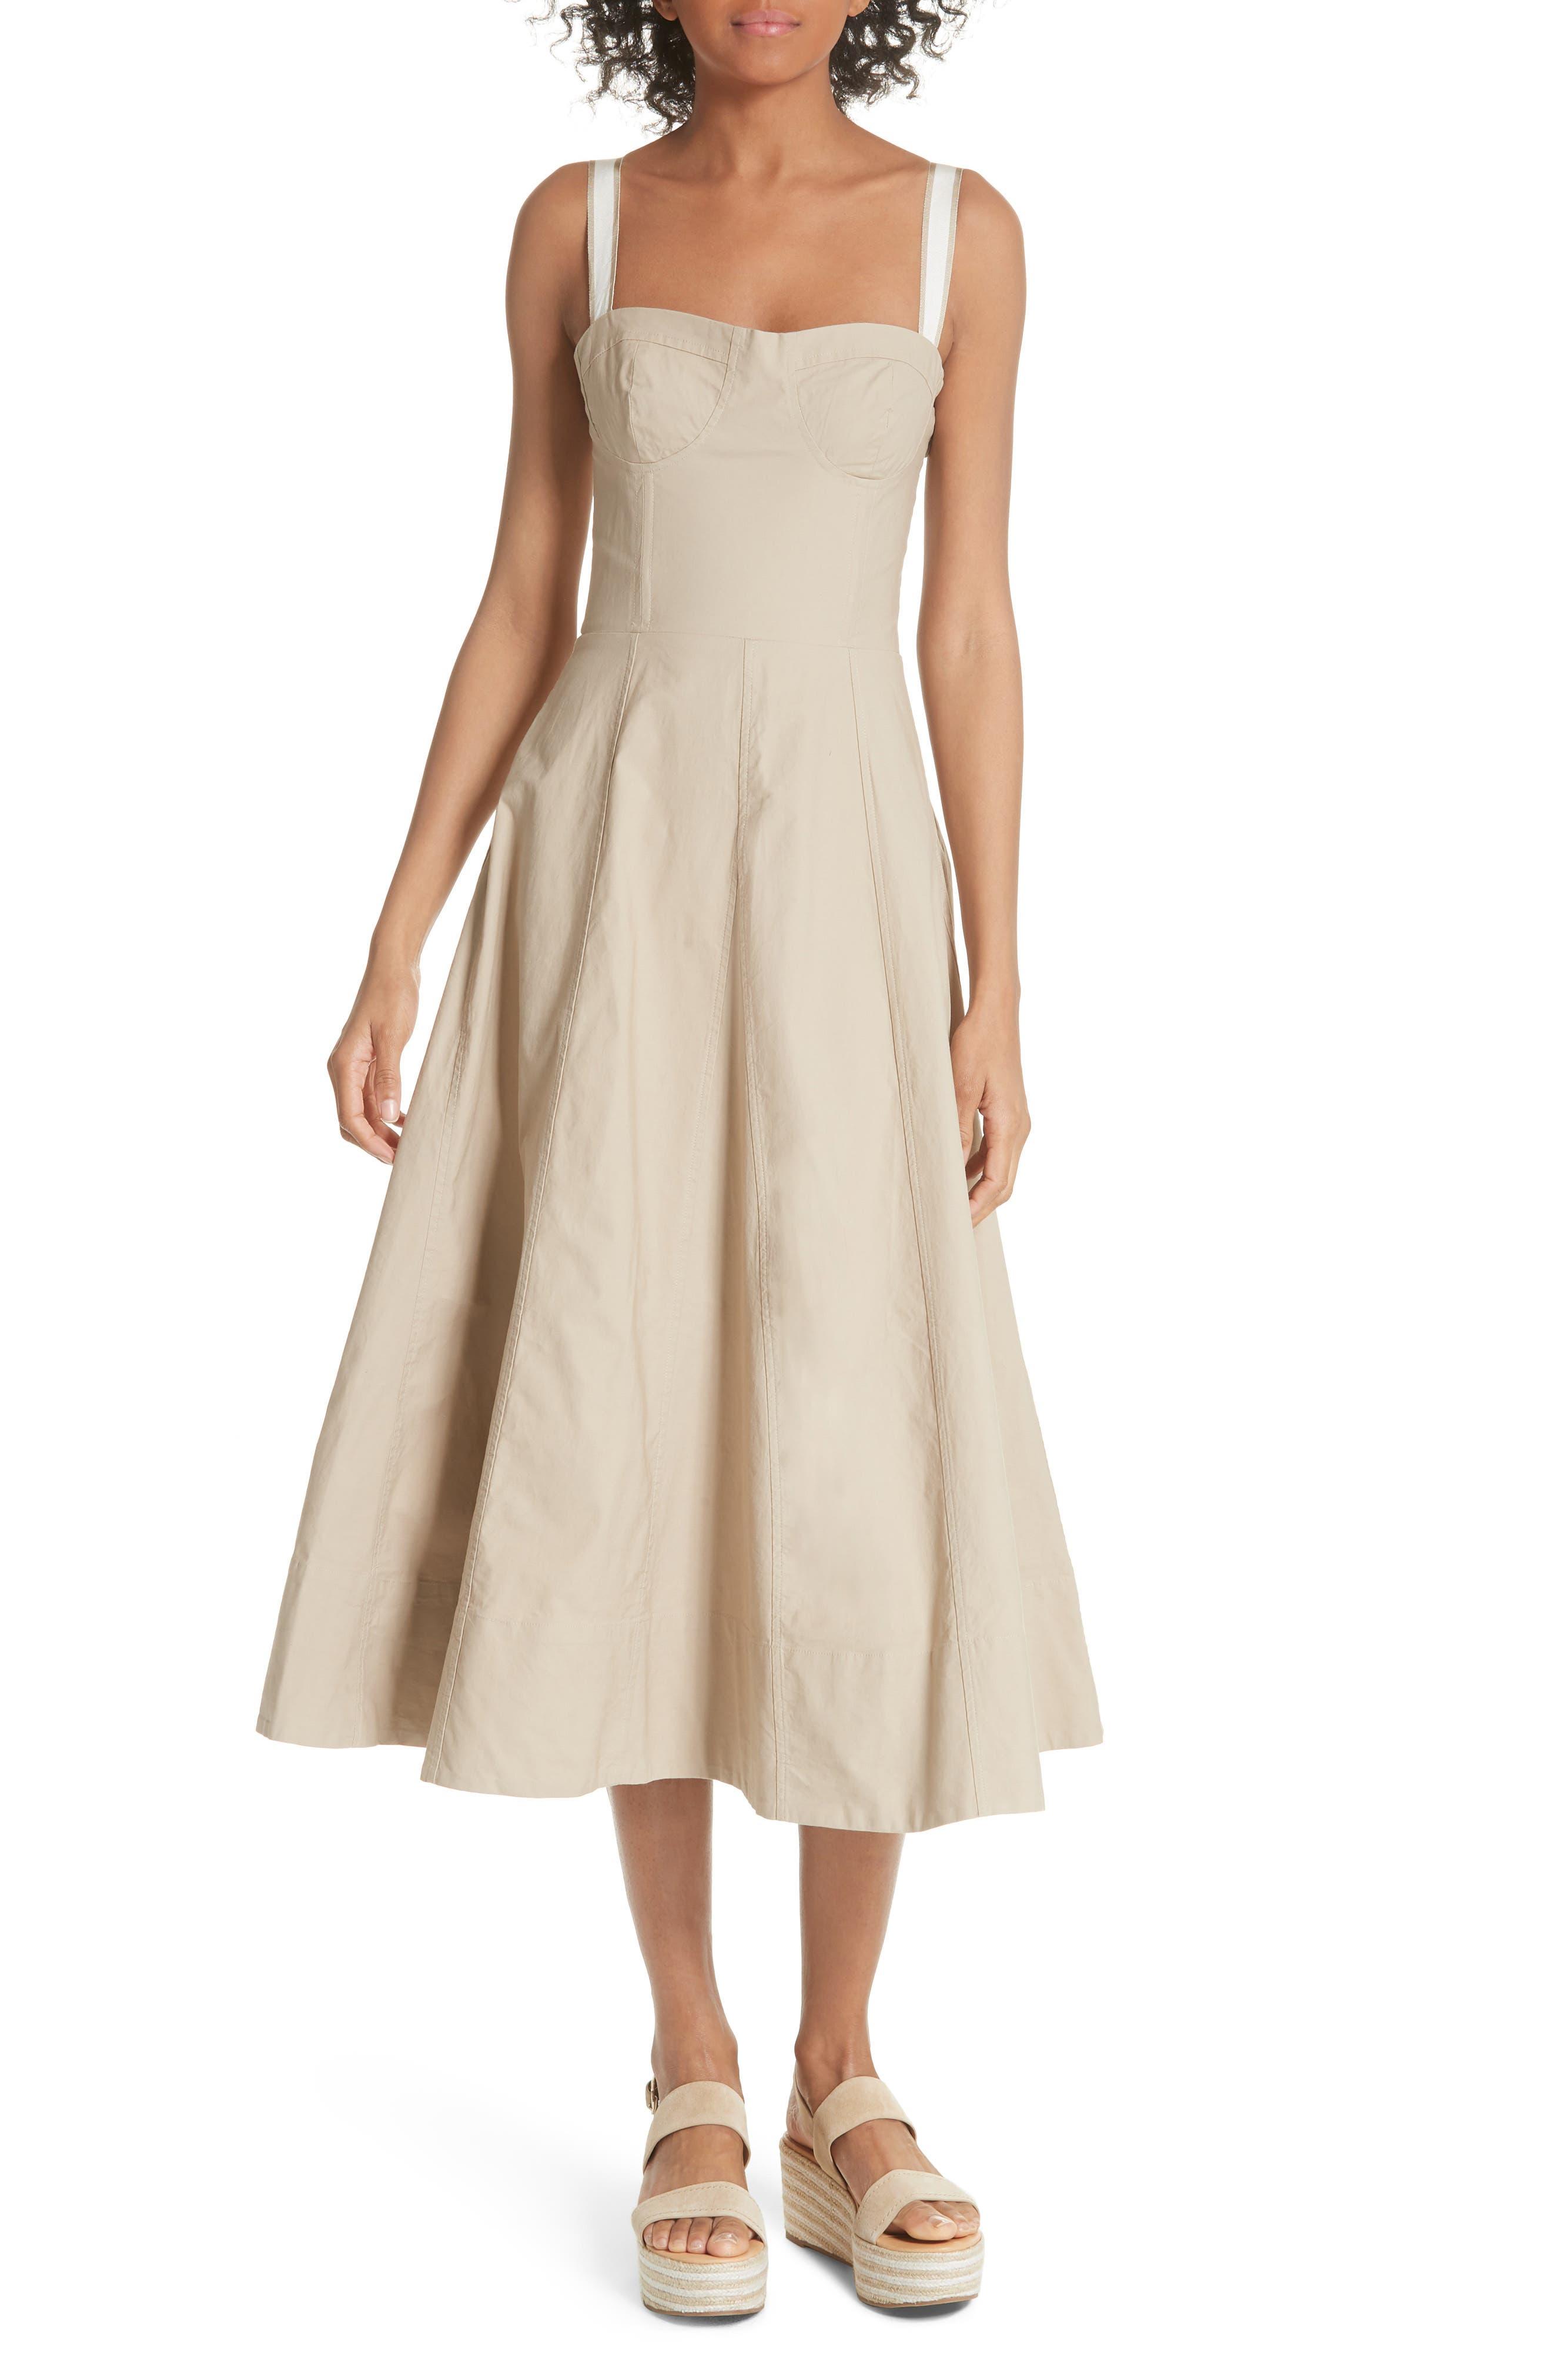 Briel Midi Dress,                         Main,                         color, Light Sand